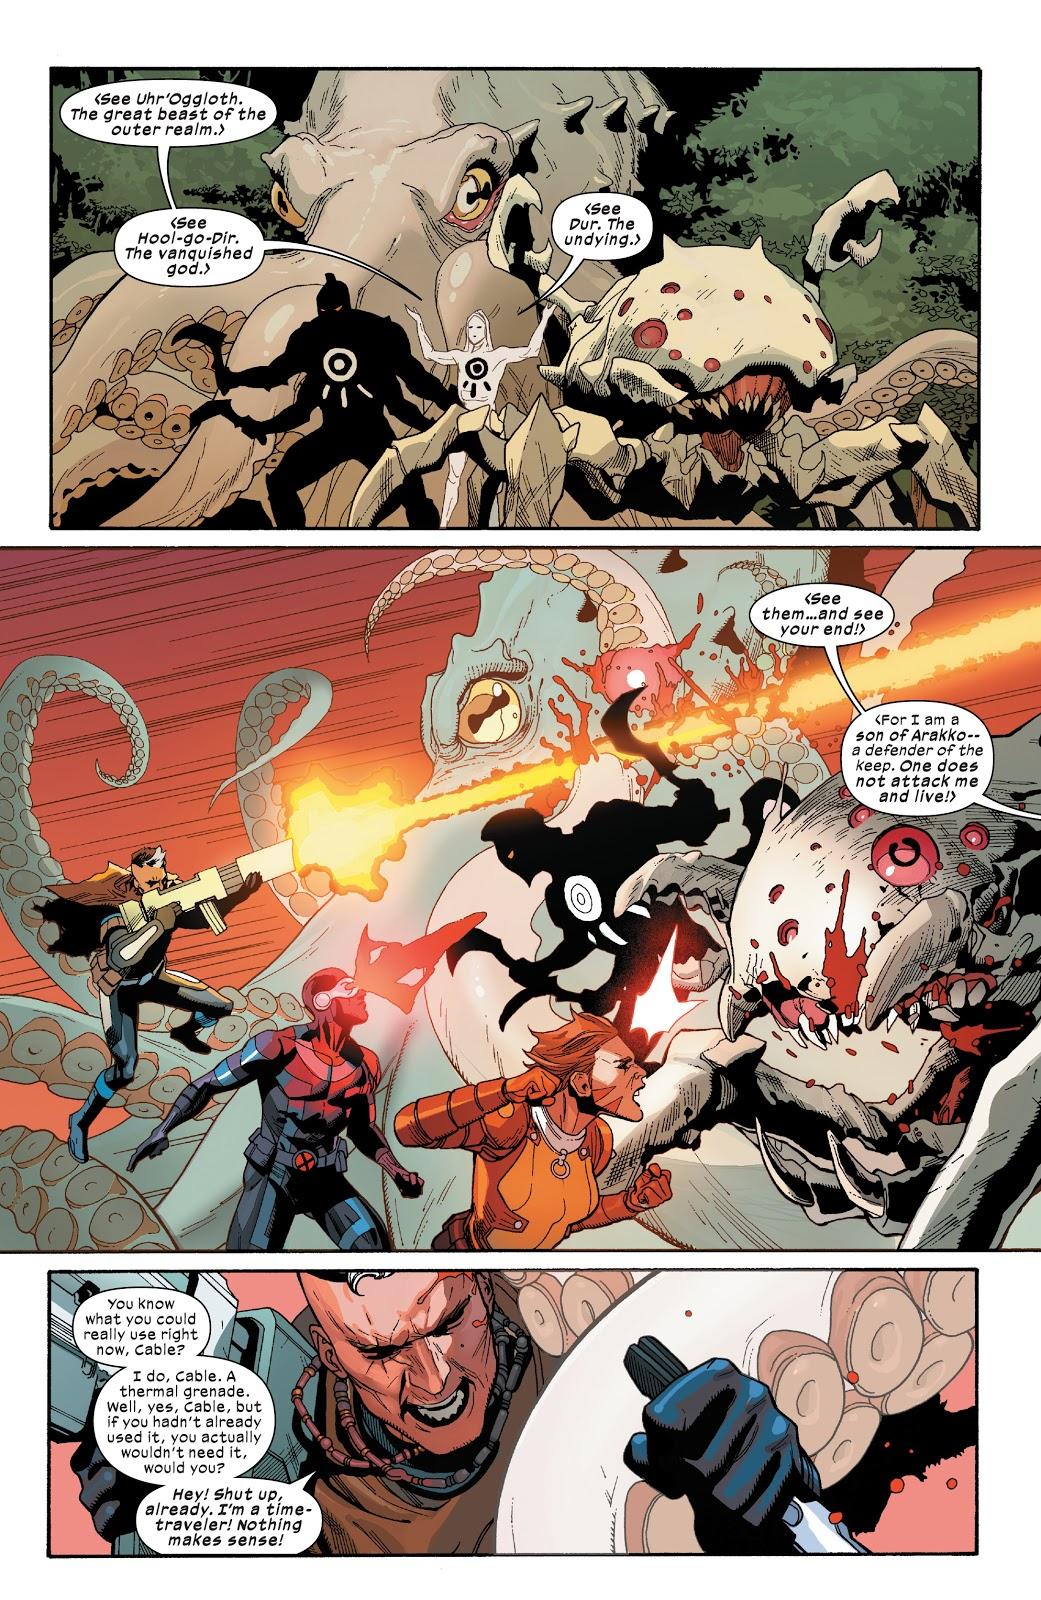 X-Men by Jonathan Hickman Vol. 1 review